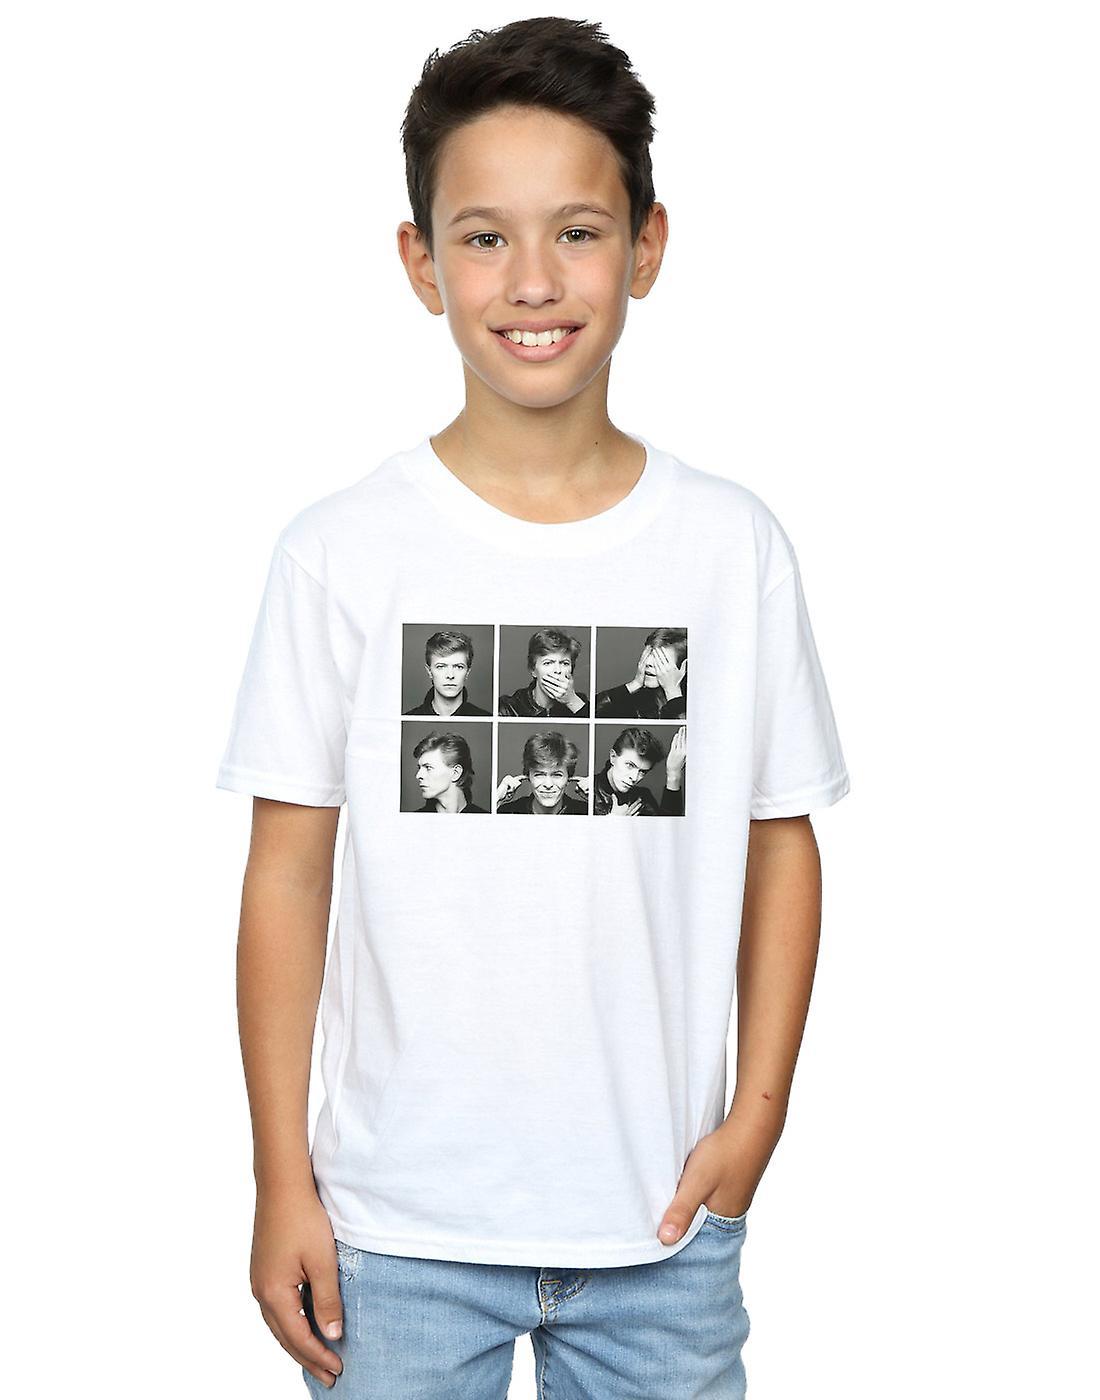 David Bowie Boys Photo Collage T-Shirt